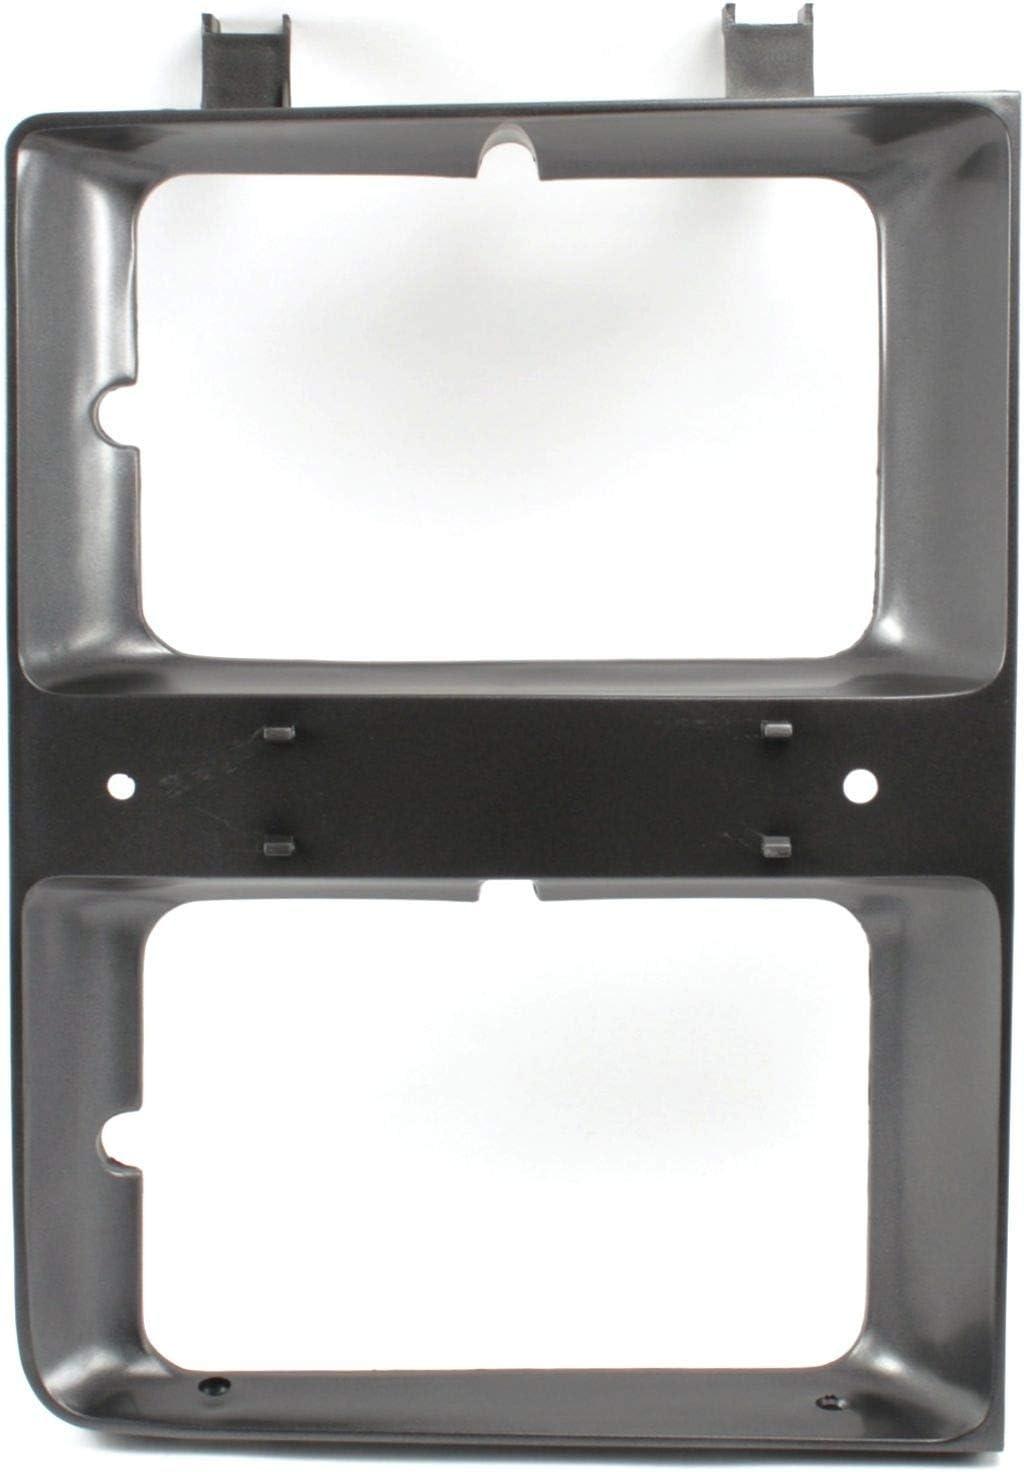 Right New Headlight Door//Bezel Chevy Blazer Suburban Passenger Side RH Hand